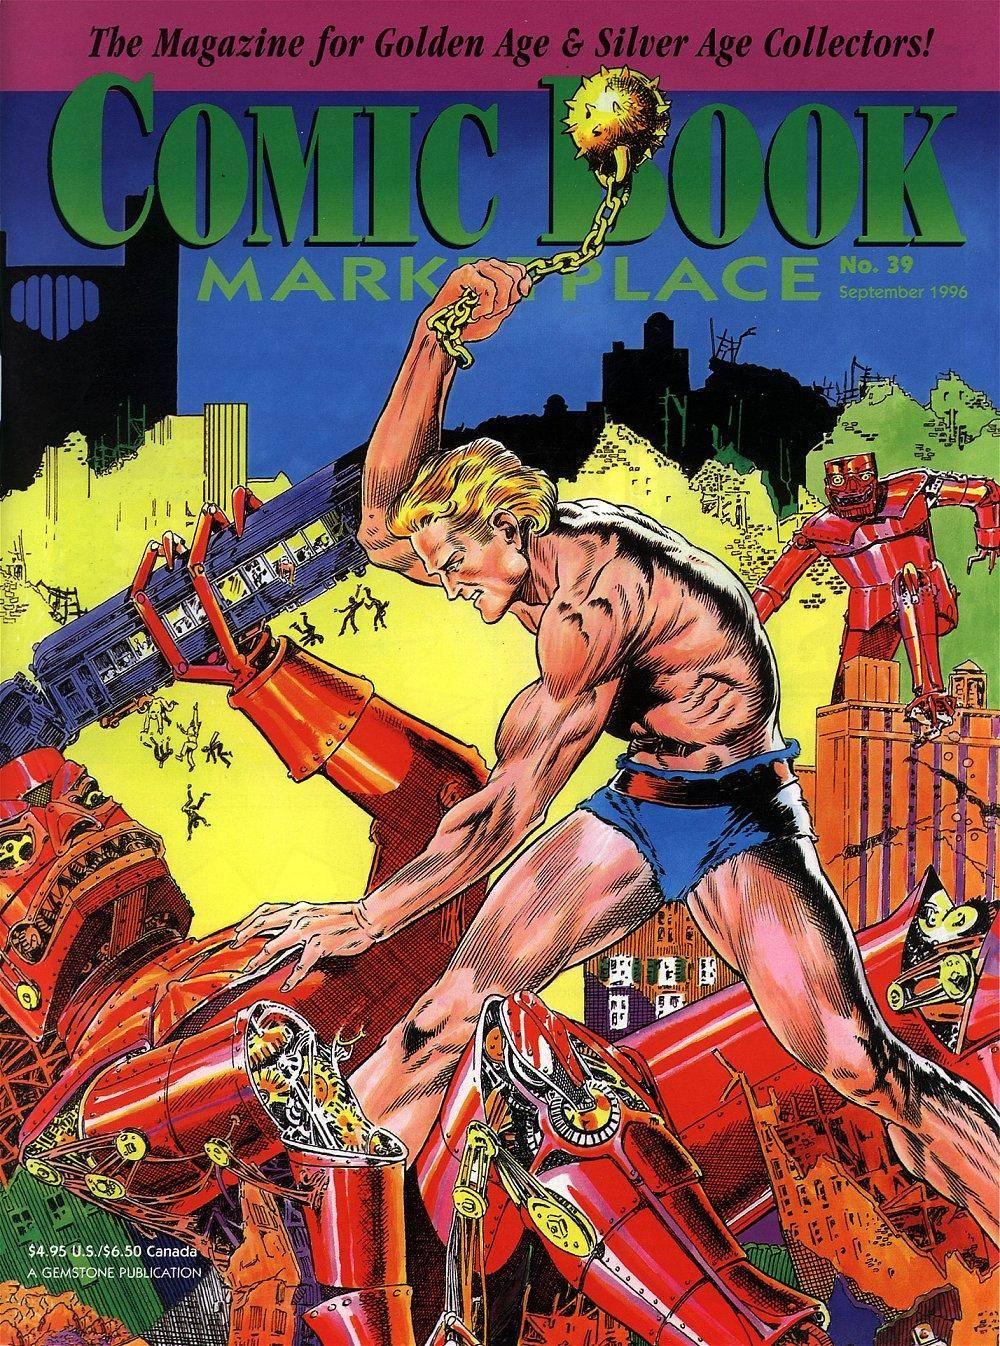 Comic Book Marketplace 039 1996